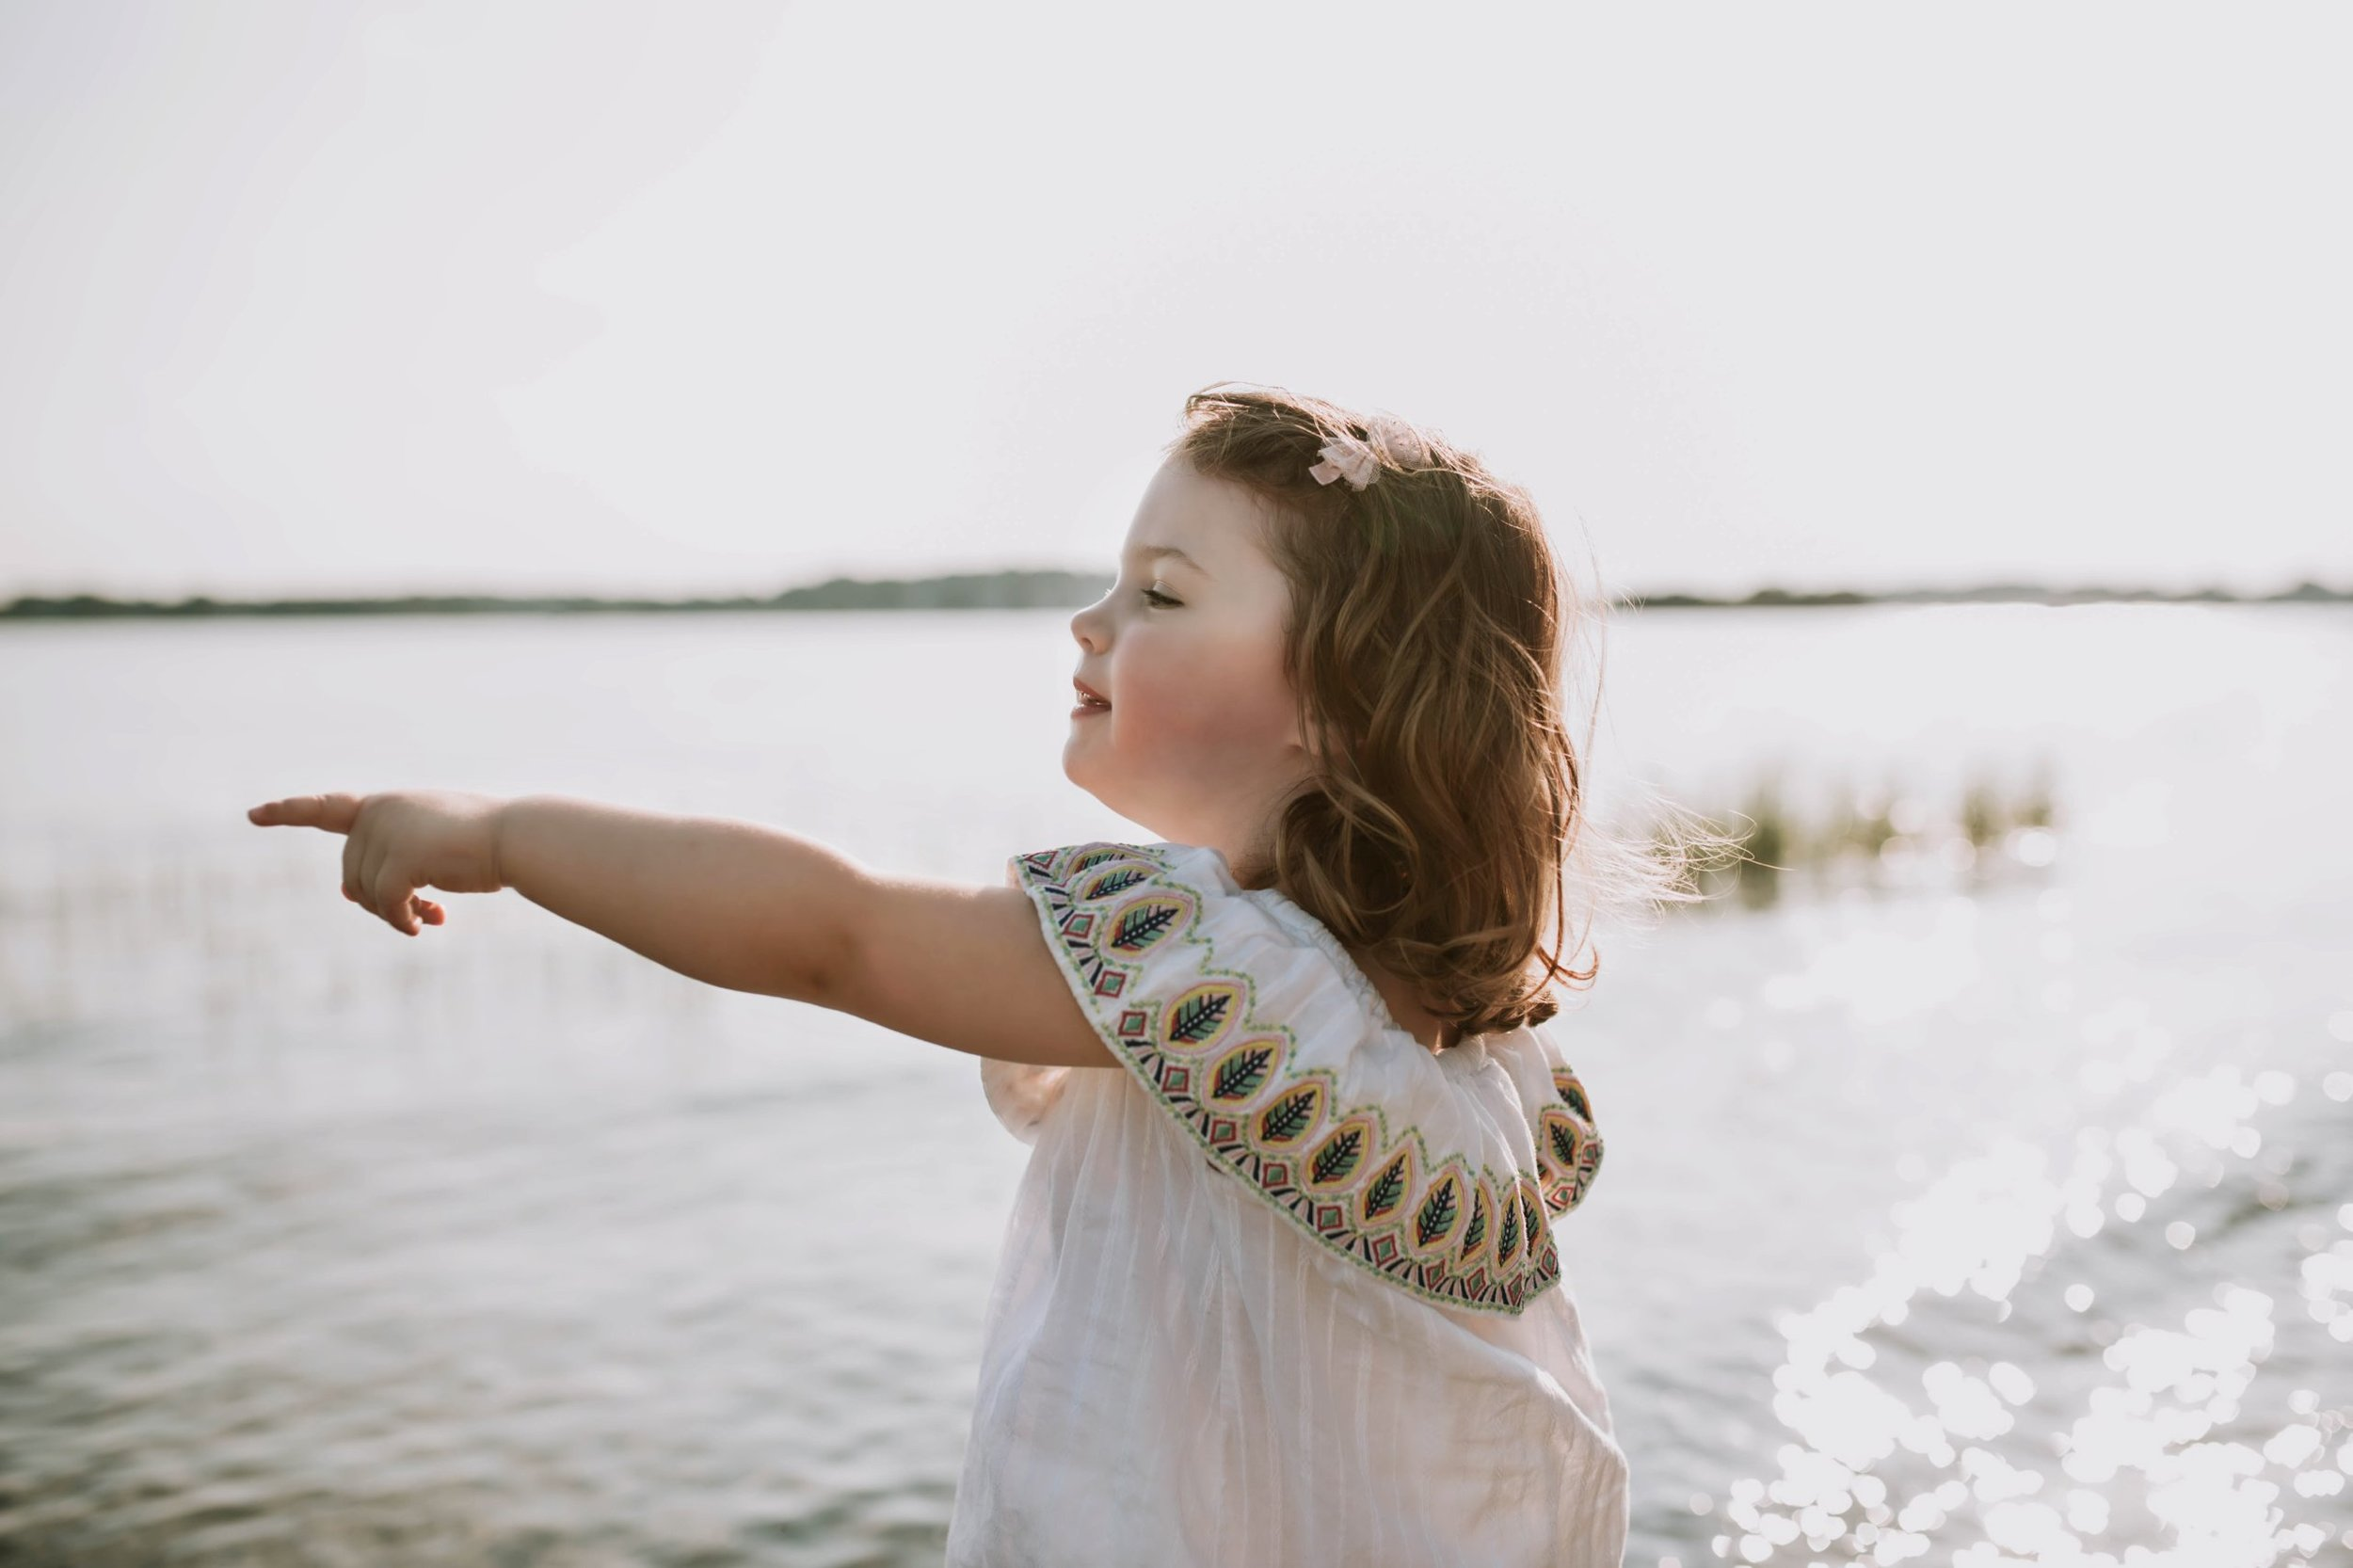 Summers_August_2018-151_Beautiful_Natural_Portraits_by_Award_Winning_Boston_Massachusetts_Family_Portrait_Photographer_Asher_and_Oak_Photography.jpg